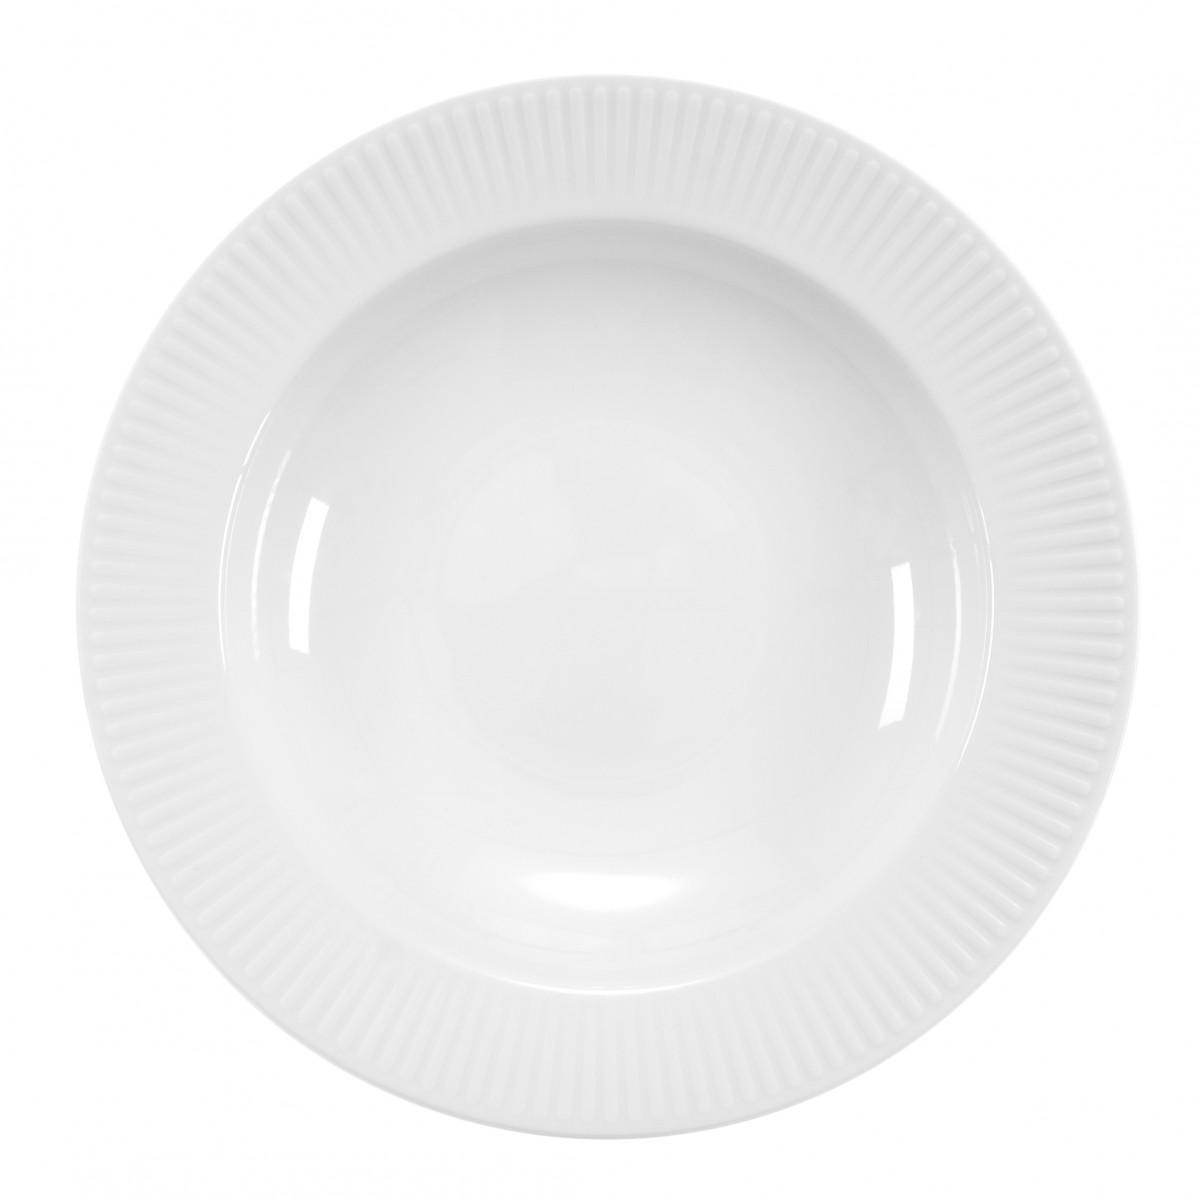 BODUM Douro pastatallerken, dia. 28 cm, porcelæn, hvid 4 stk.